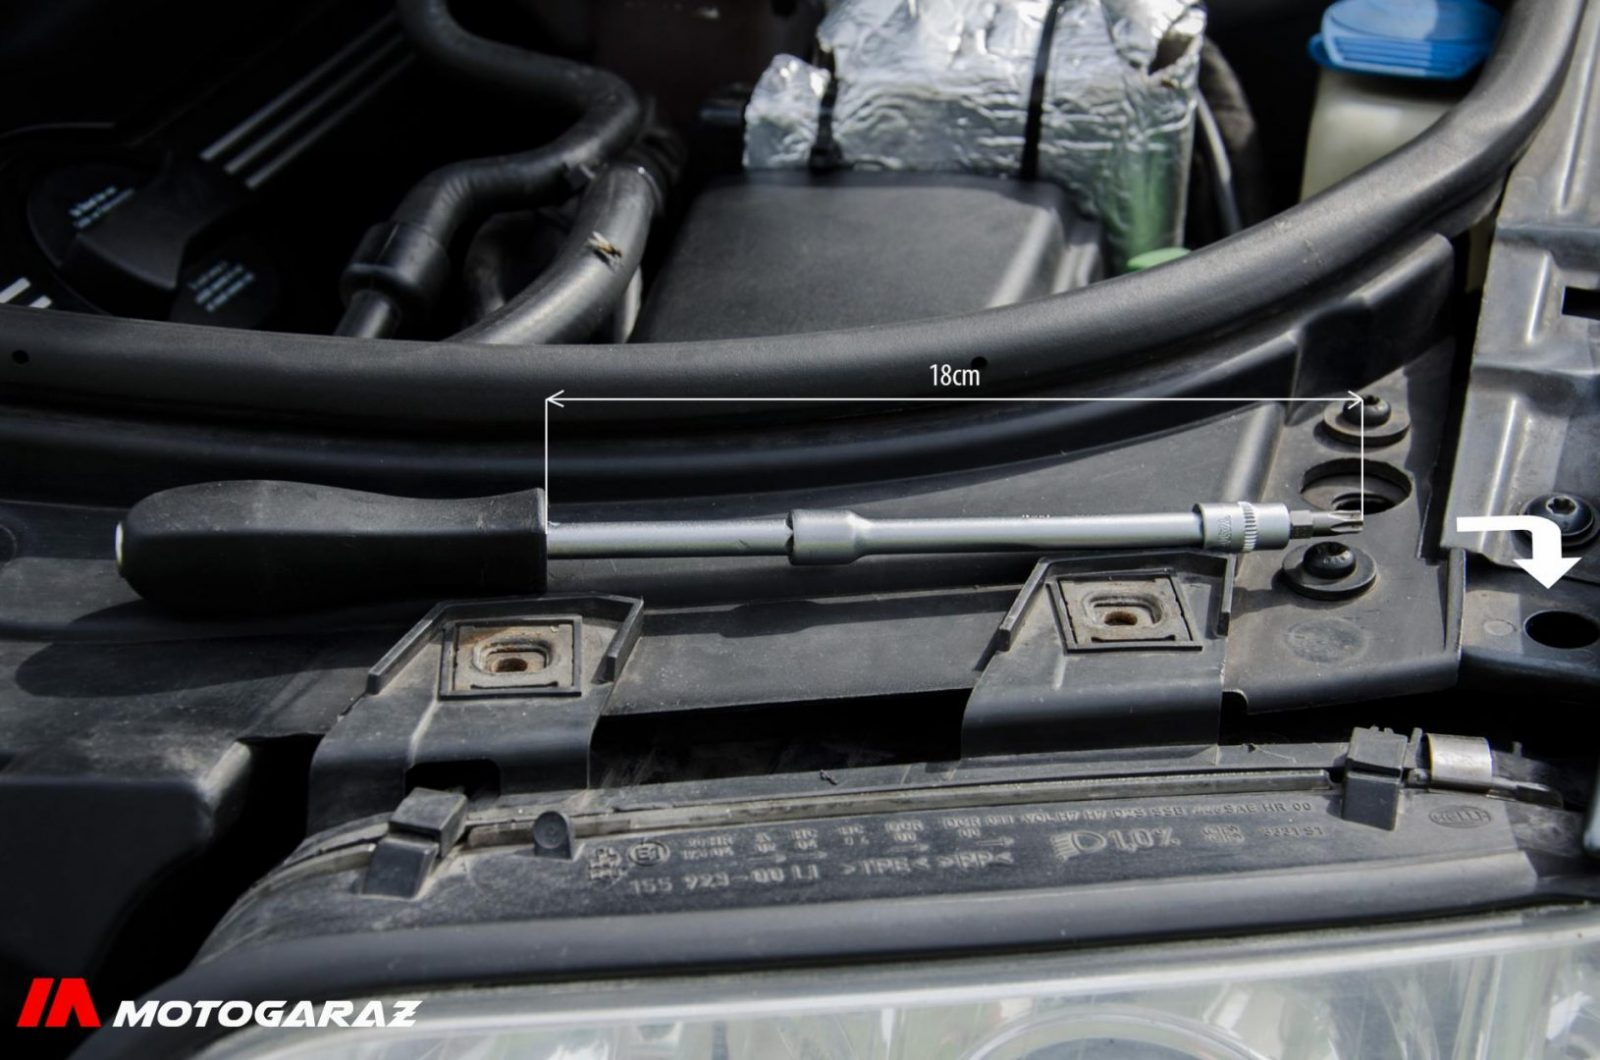 Wymiana lampy Audi a6c5 - fot. nr 4